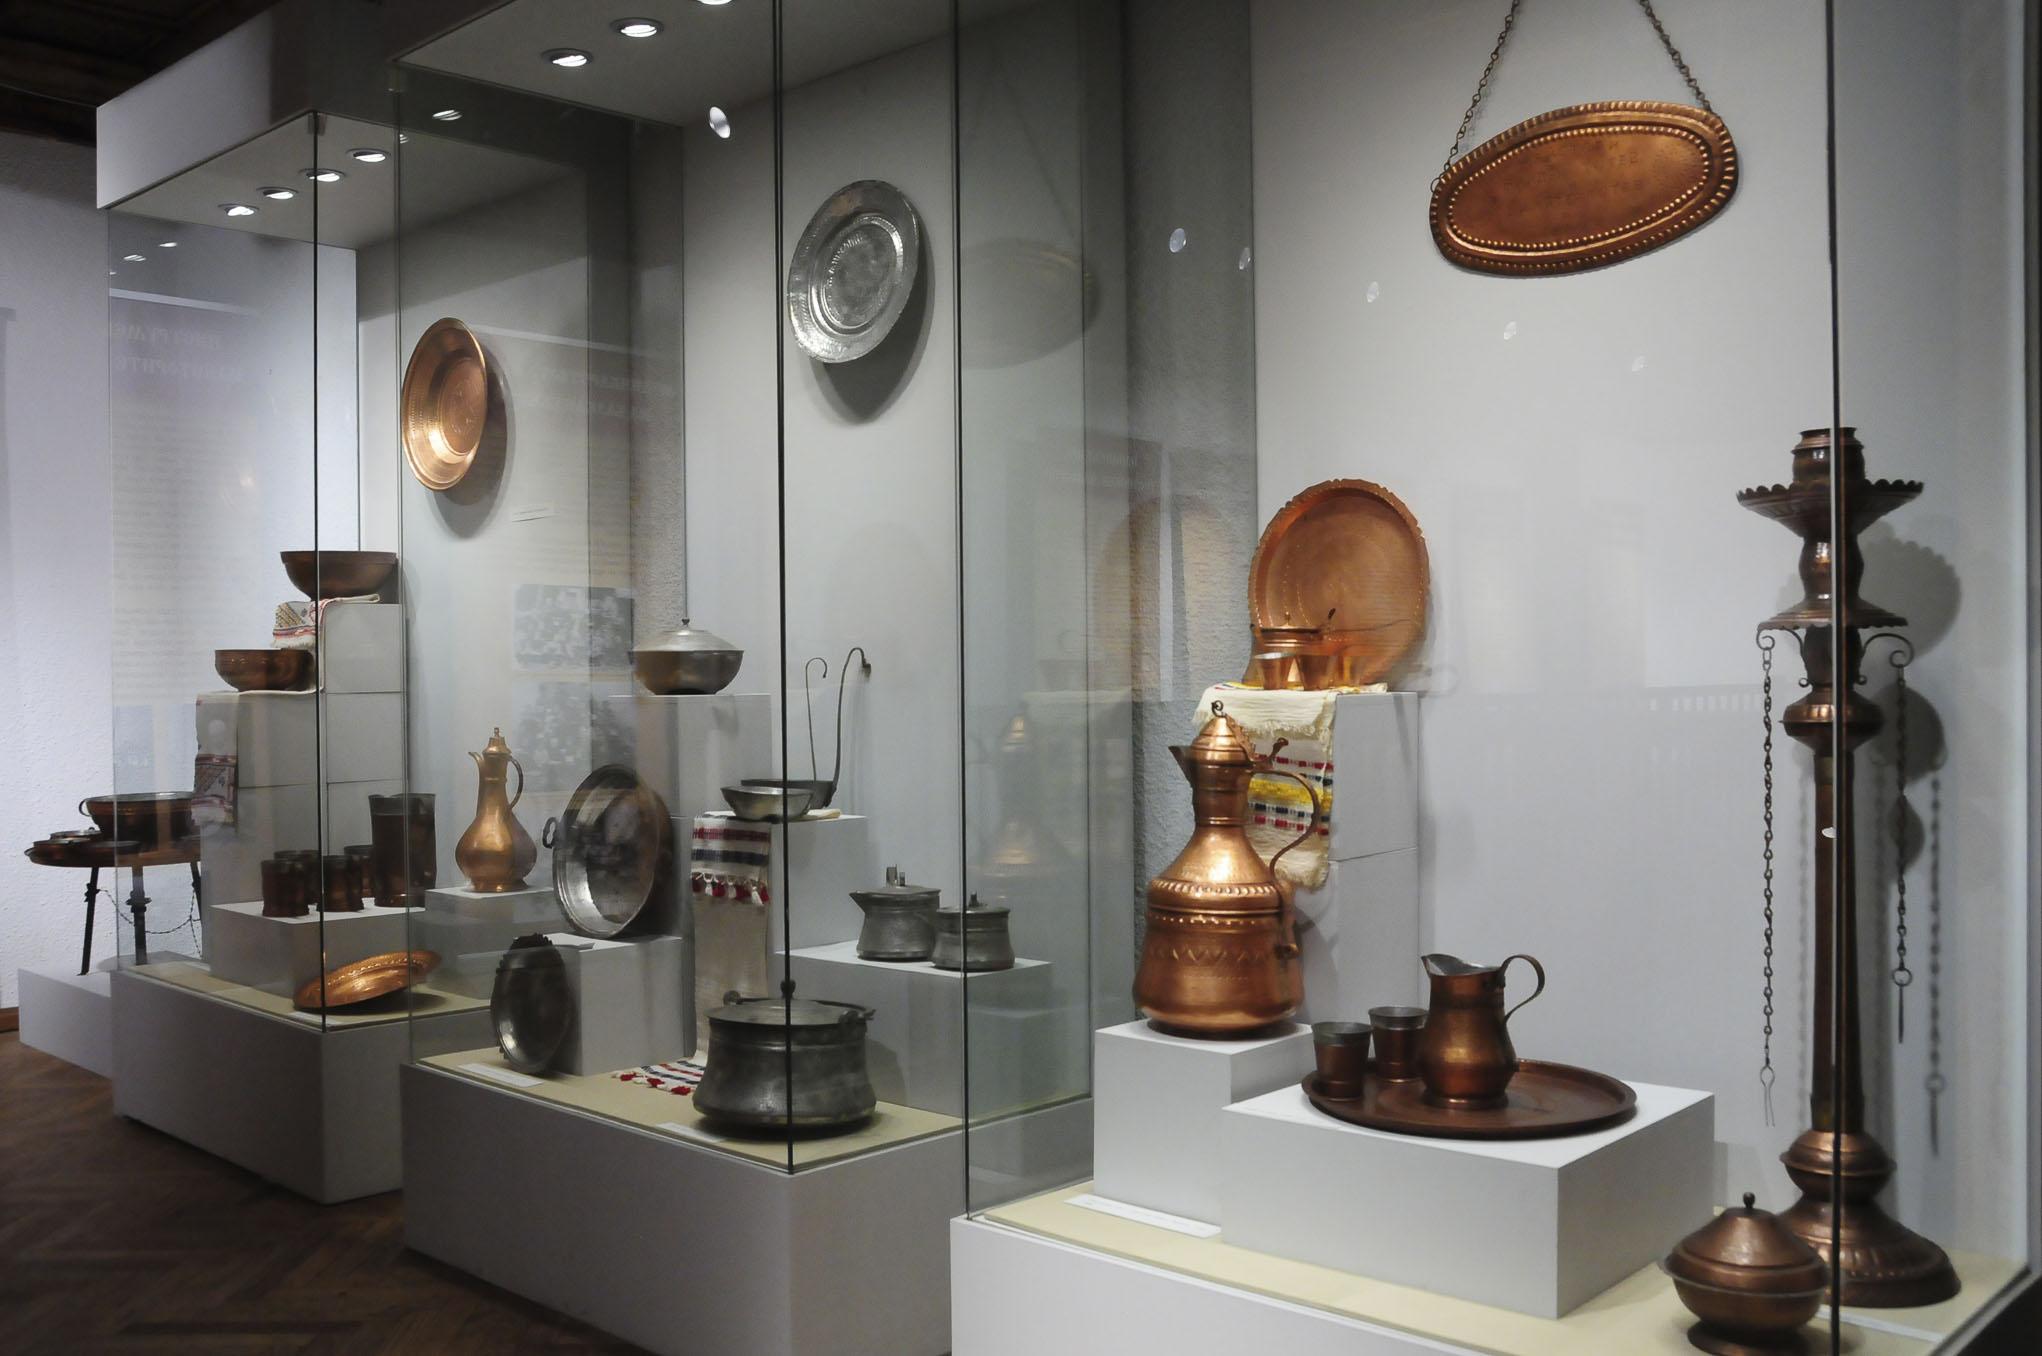 troyan-museum-mednikarstvo-ot-troyanskiq-krai-31